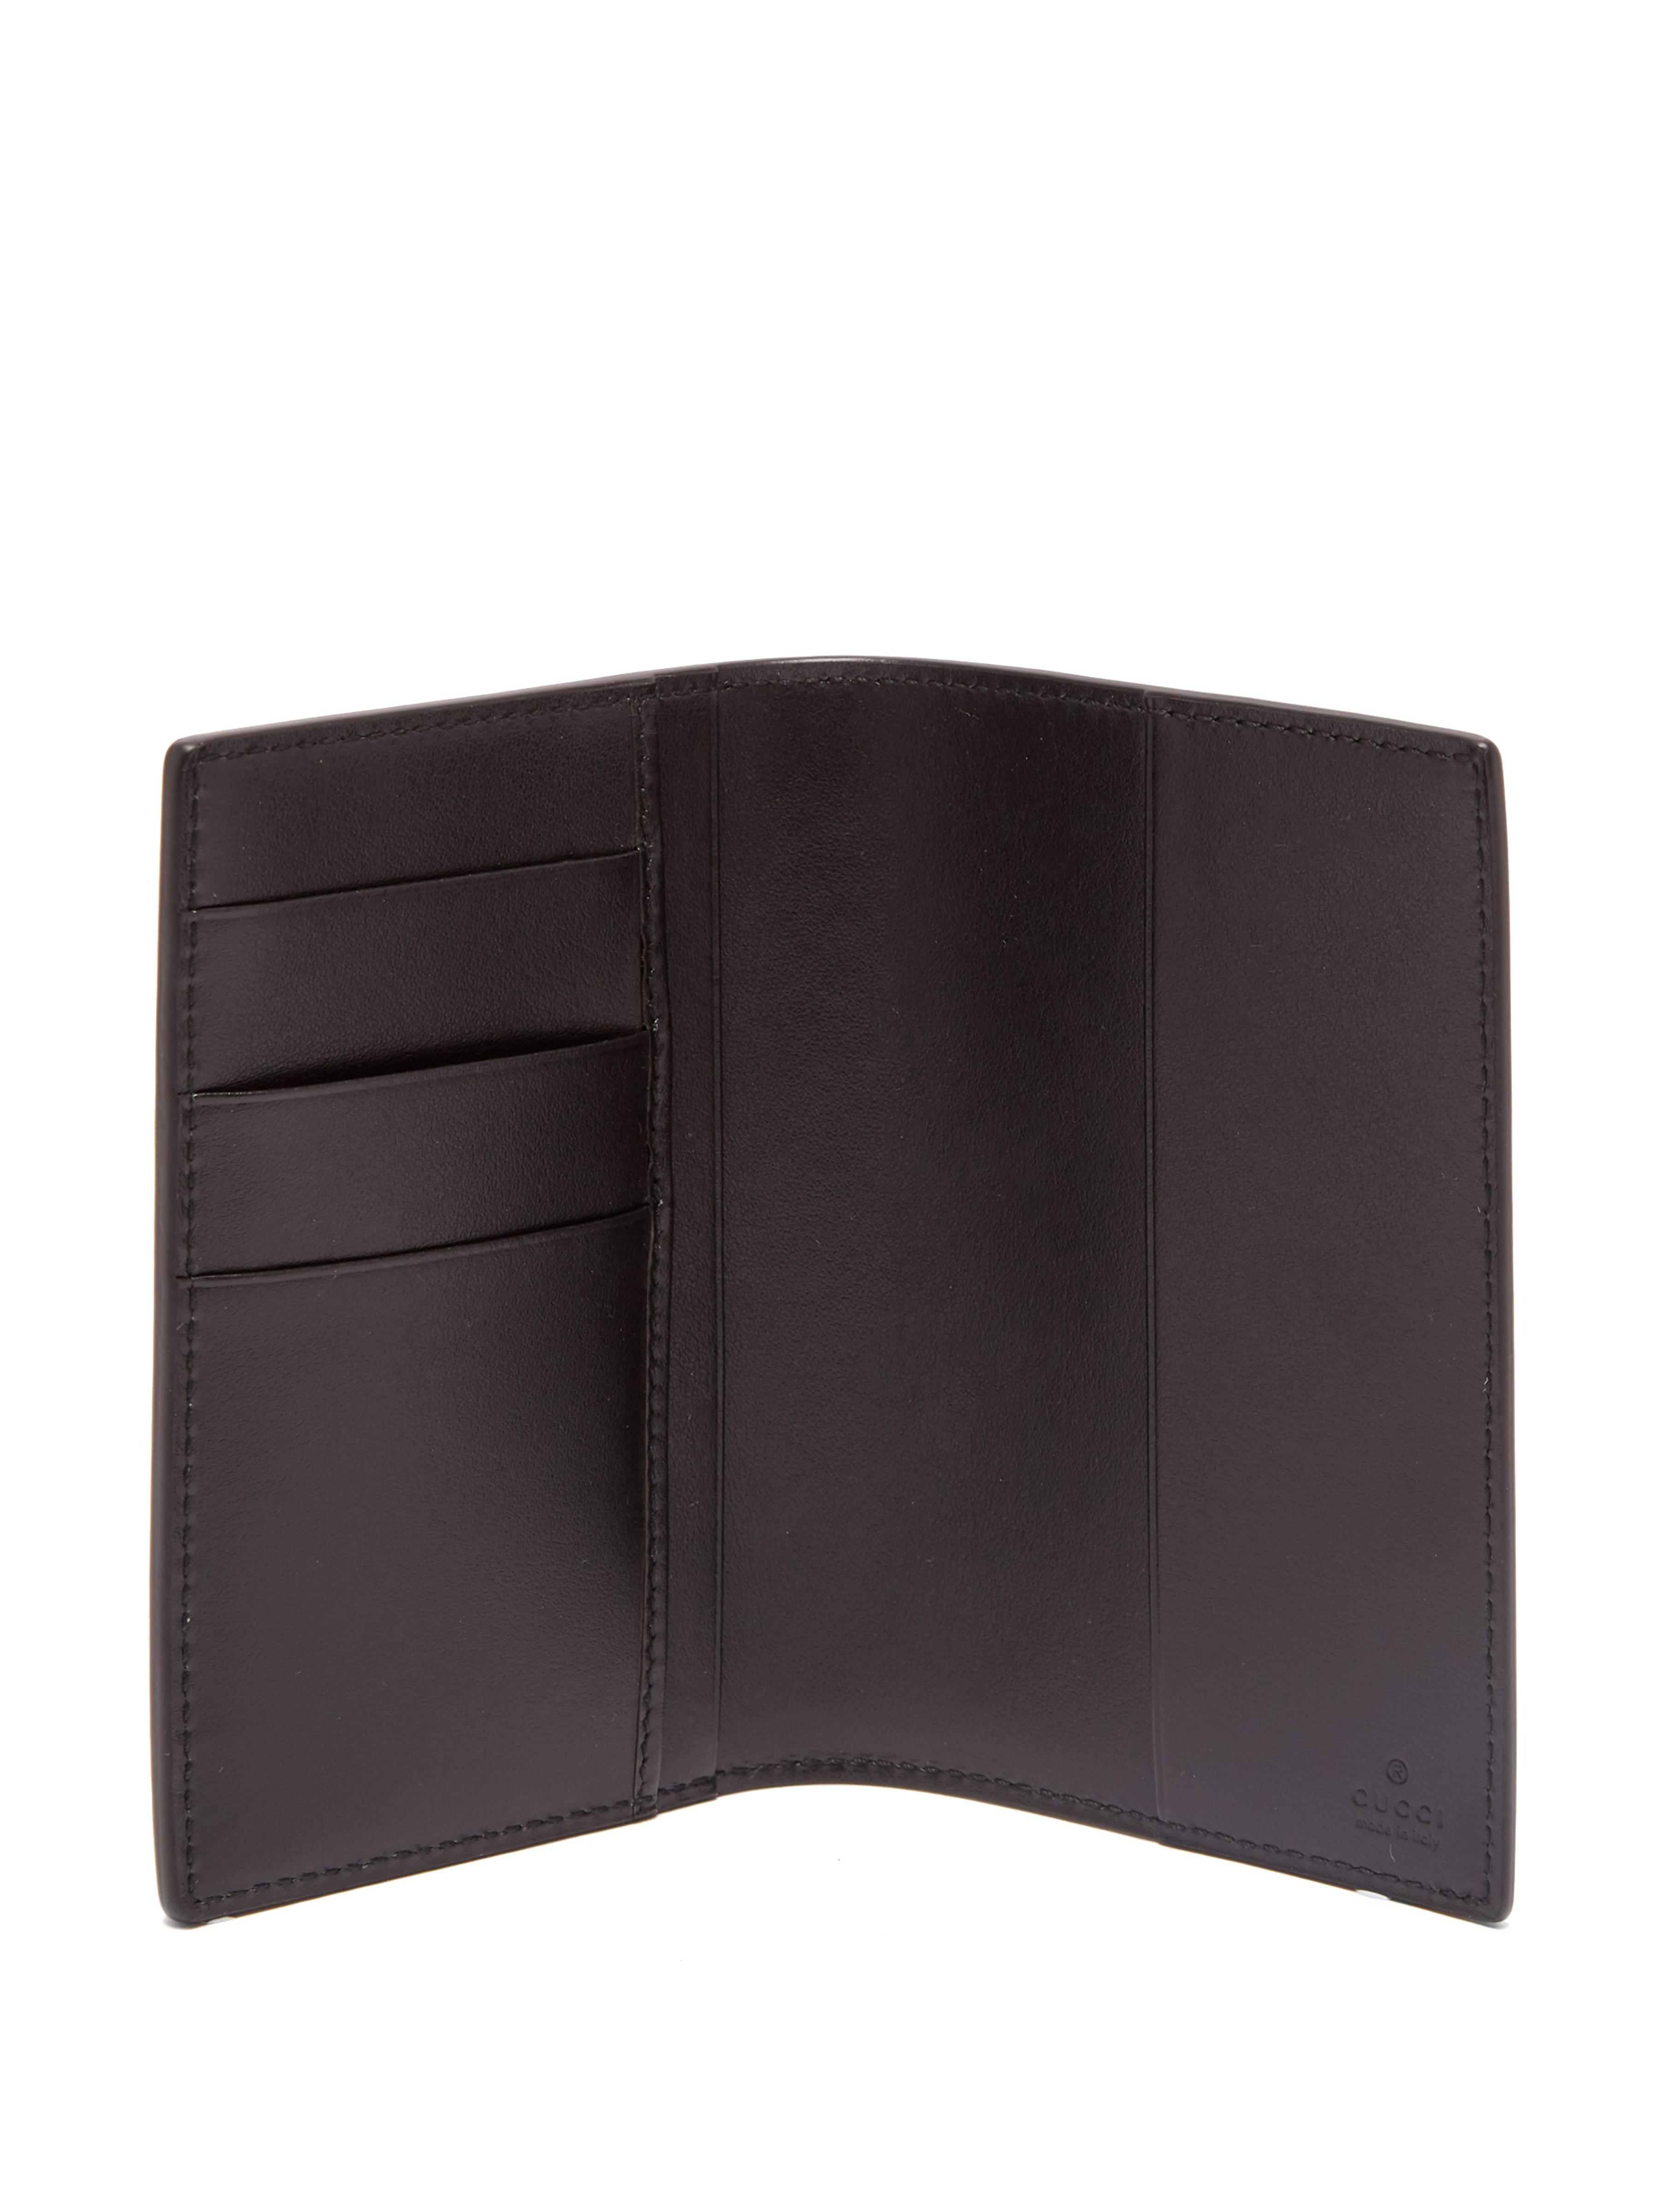 76b5cb78d834 Gucci Logo Leather Passport Holder in Black for Men - Lyst